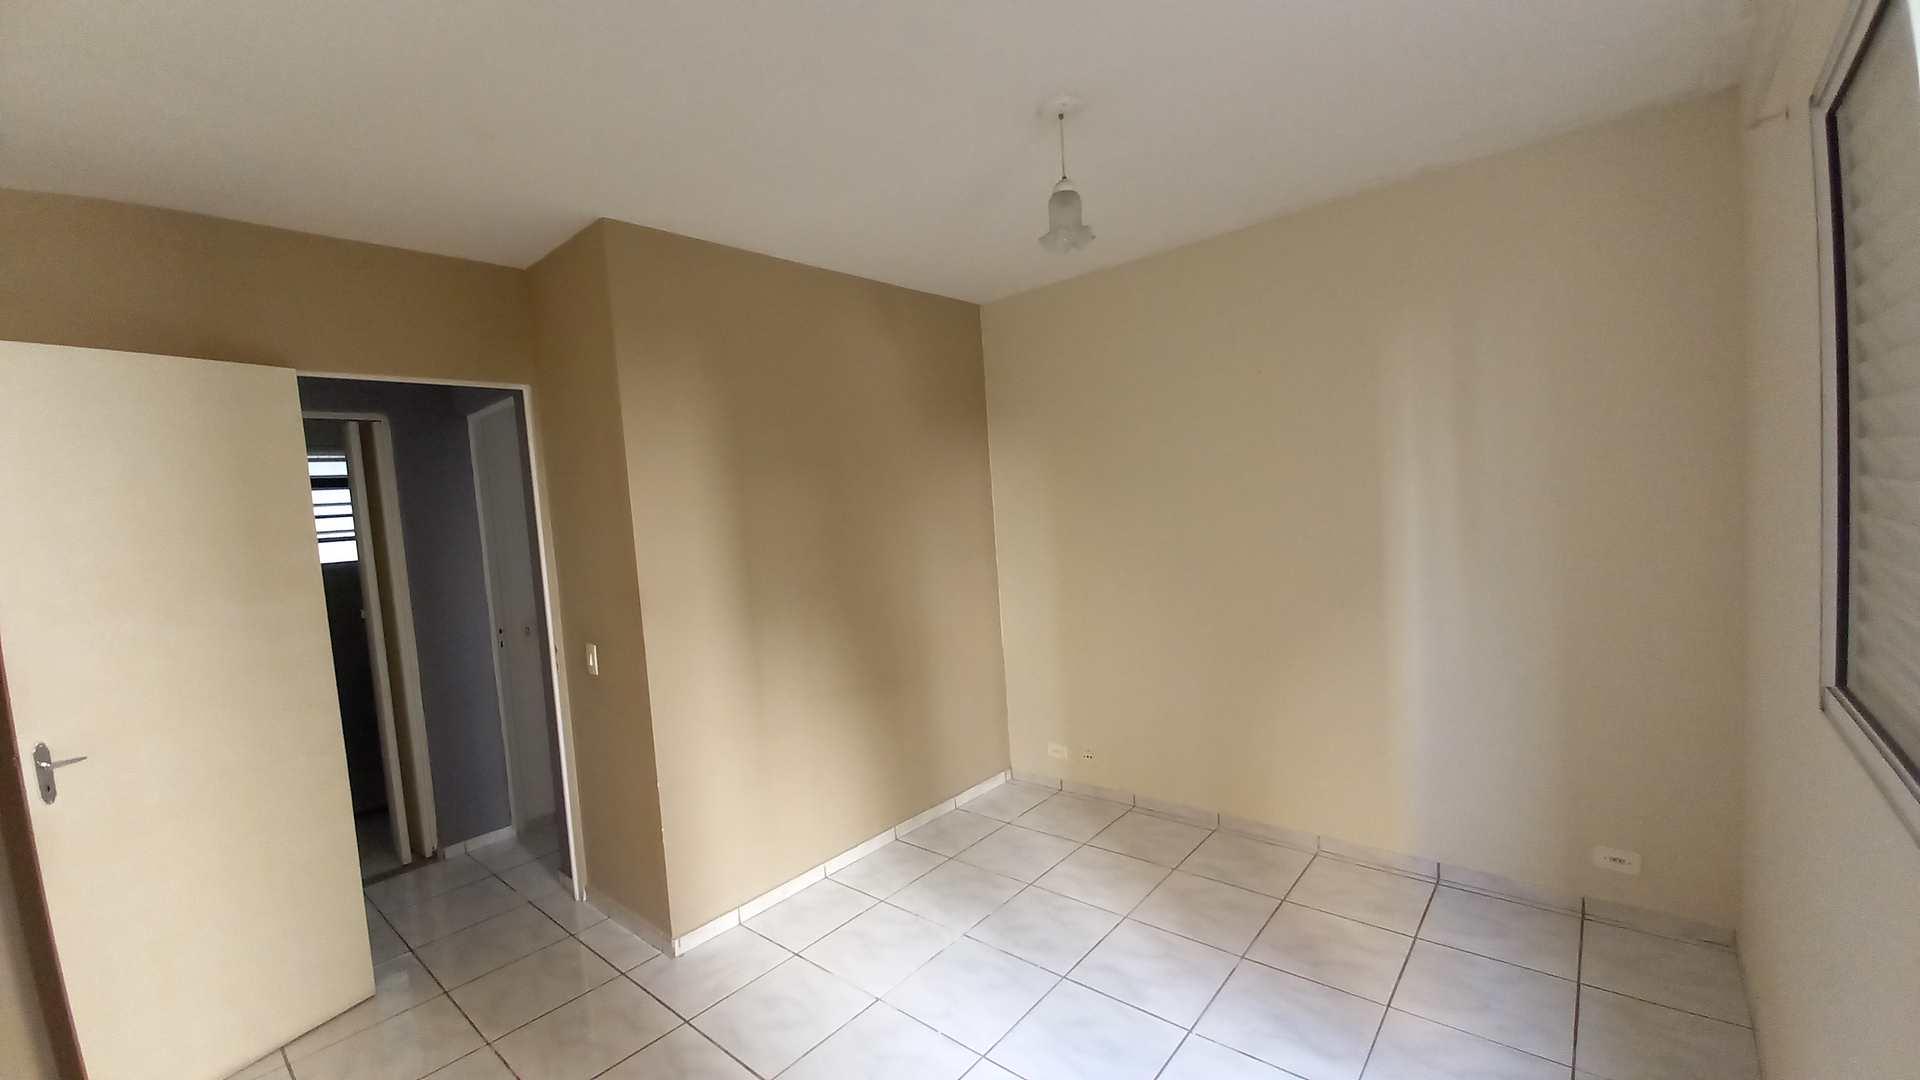 Apartamento com 2 dorms, Vila Urupês, Suzano - R$ 180 mil, Cod: 1266